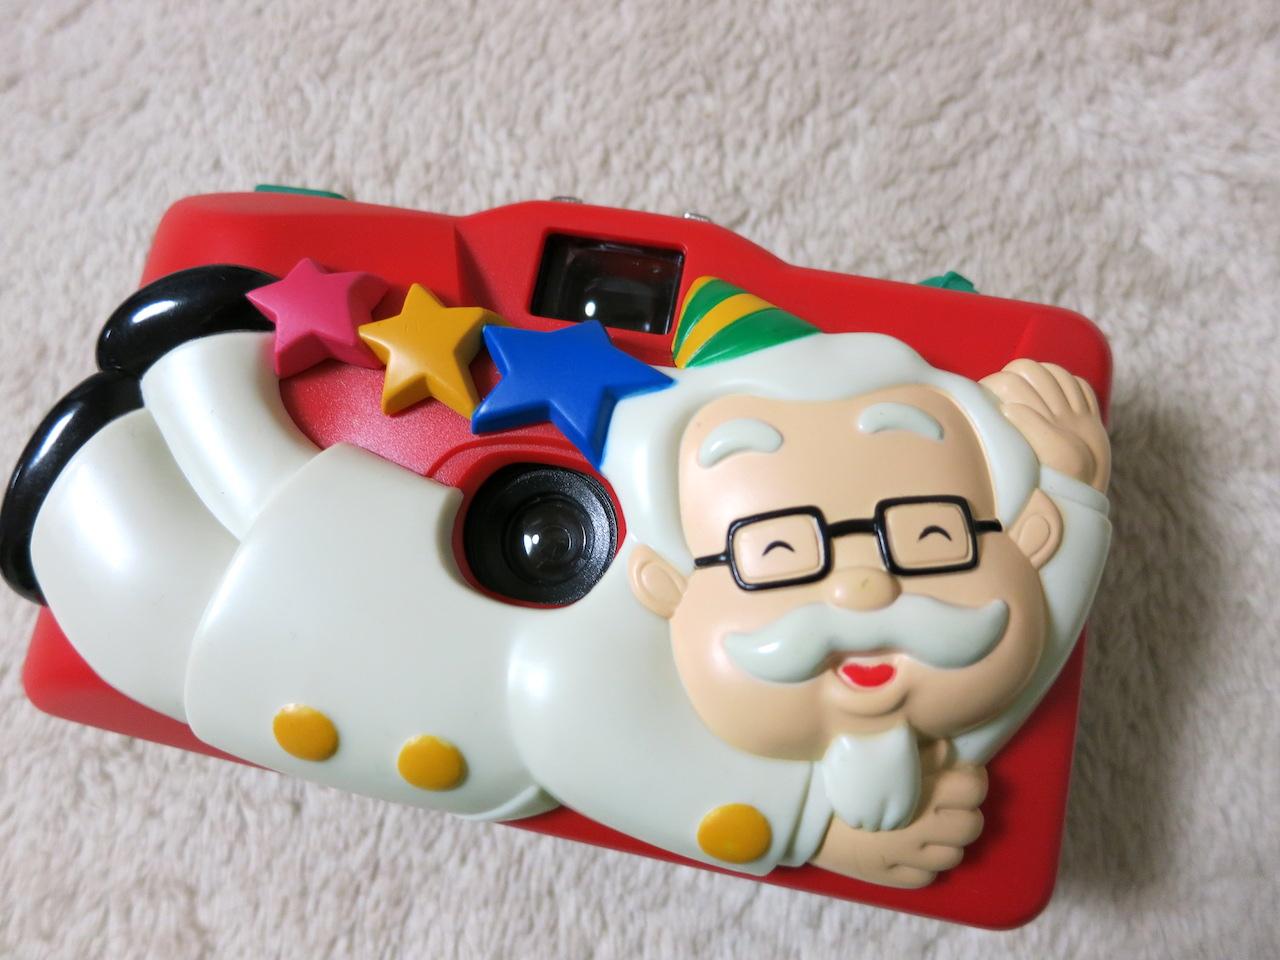 KFC Novelty ToyCamera